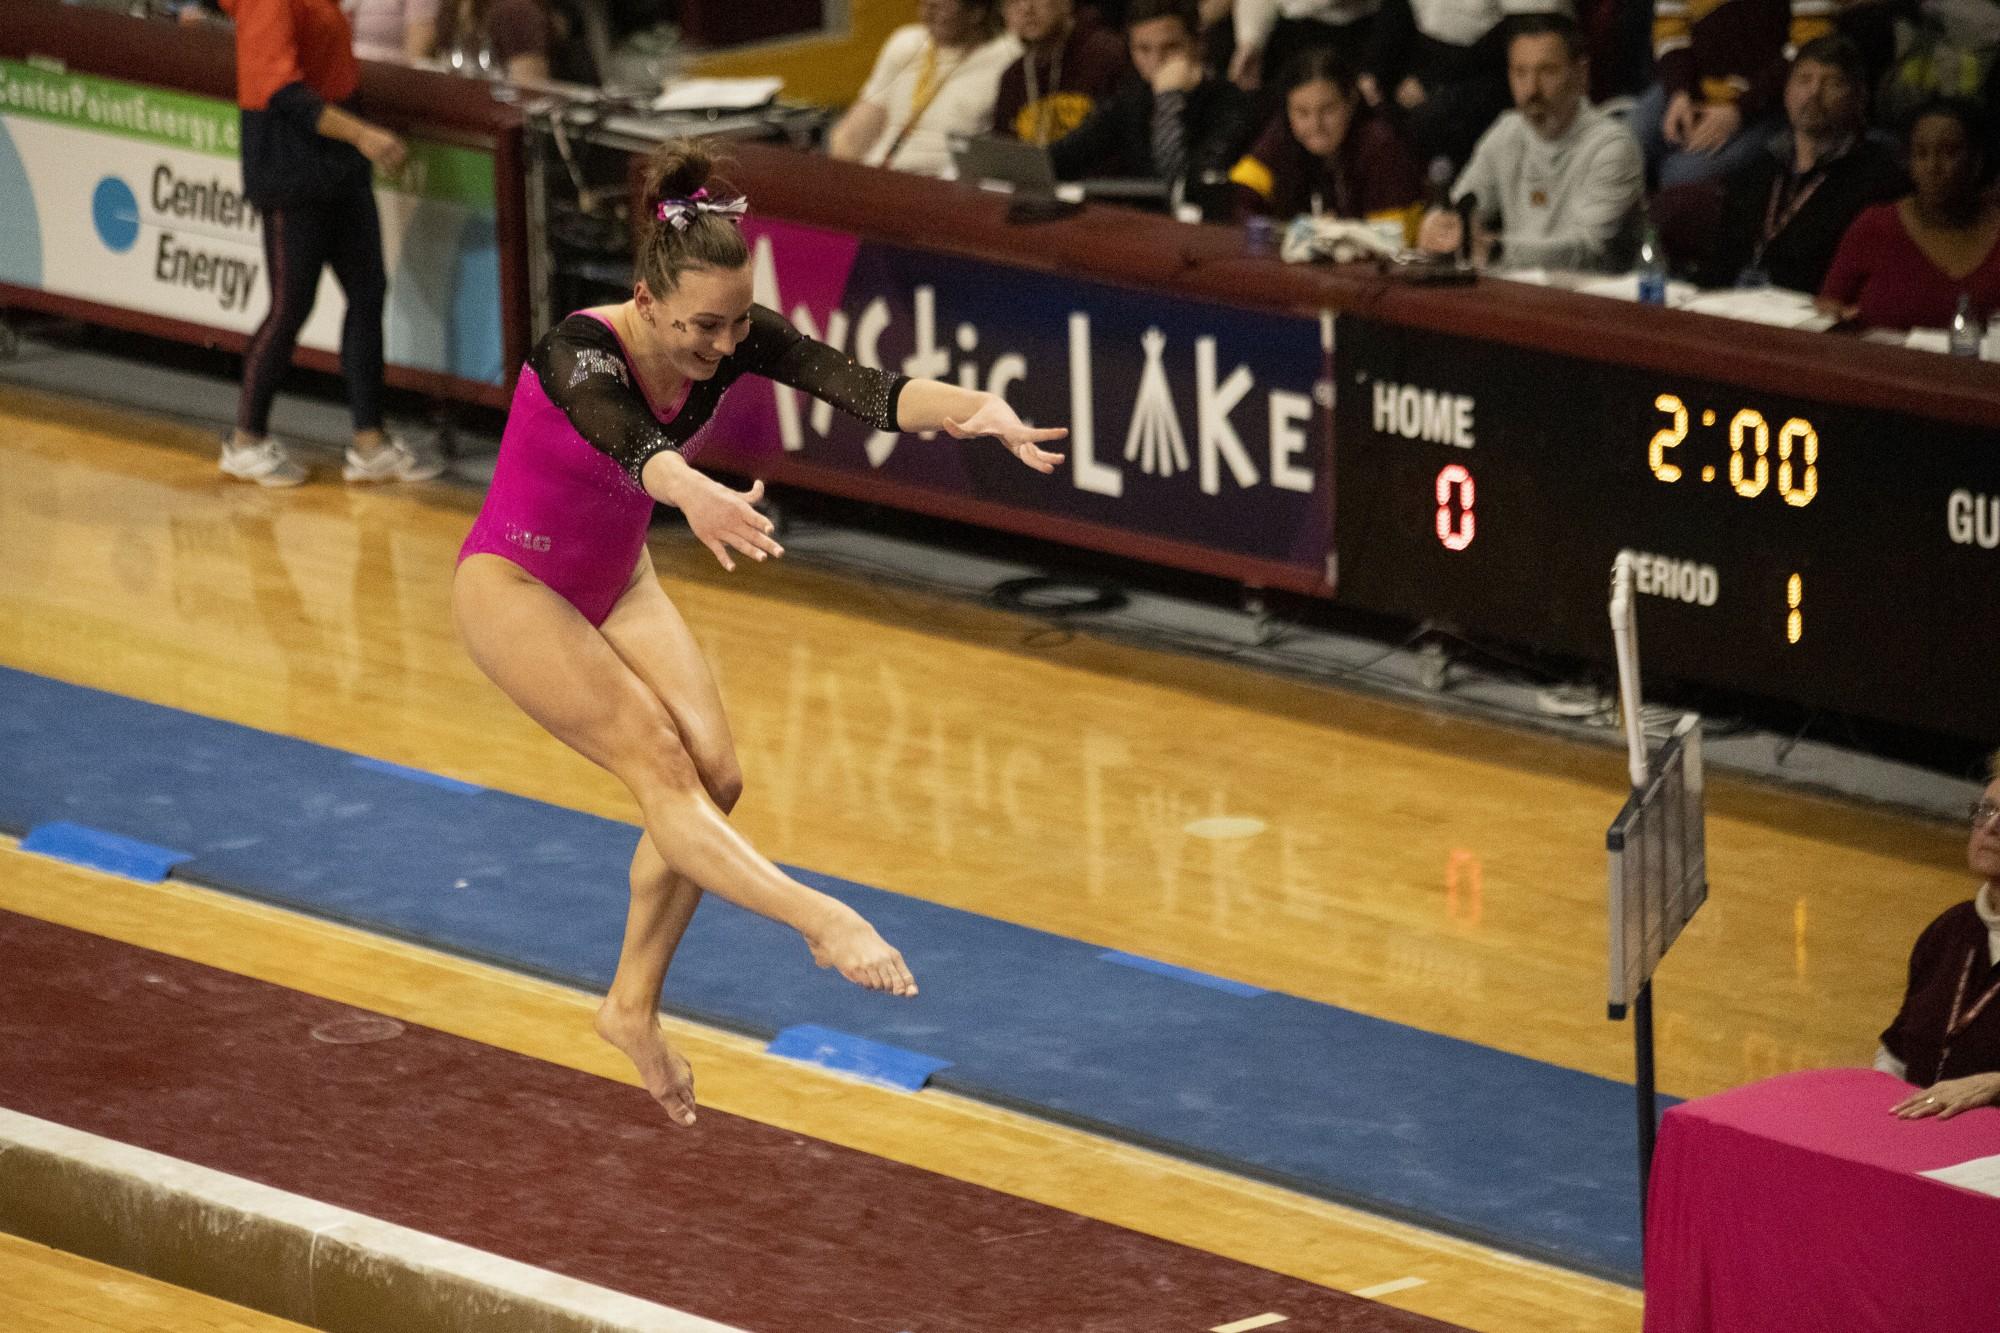 Lexy Ramler competes on the beam at the Maturi Pavillion on Saturday, Jan. 25, 2020.